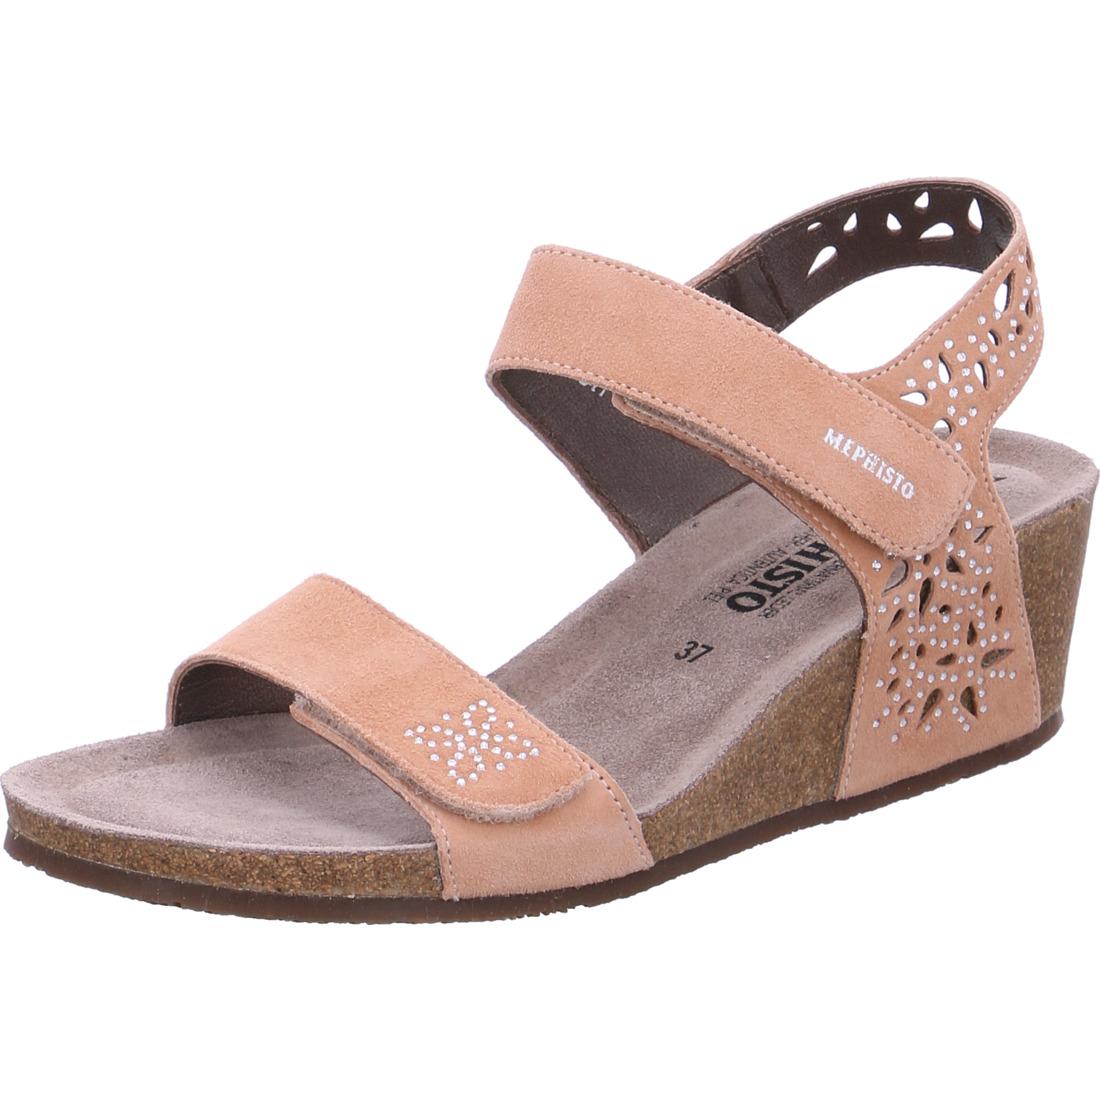 mephisto damen sandale marie sandaletten damen mephisto shop. Black Bedroom Furniture Sets. Home Design Ideas